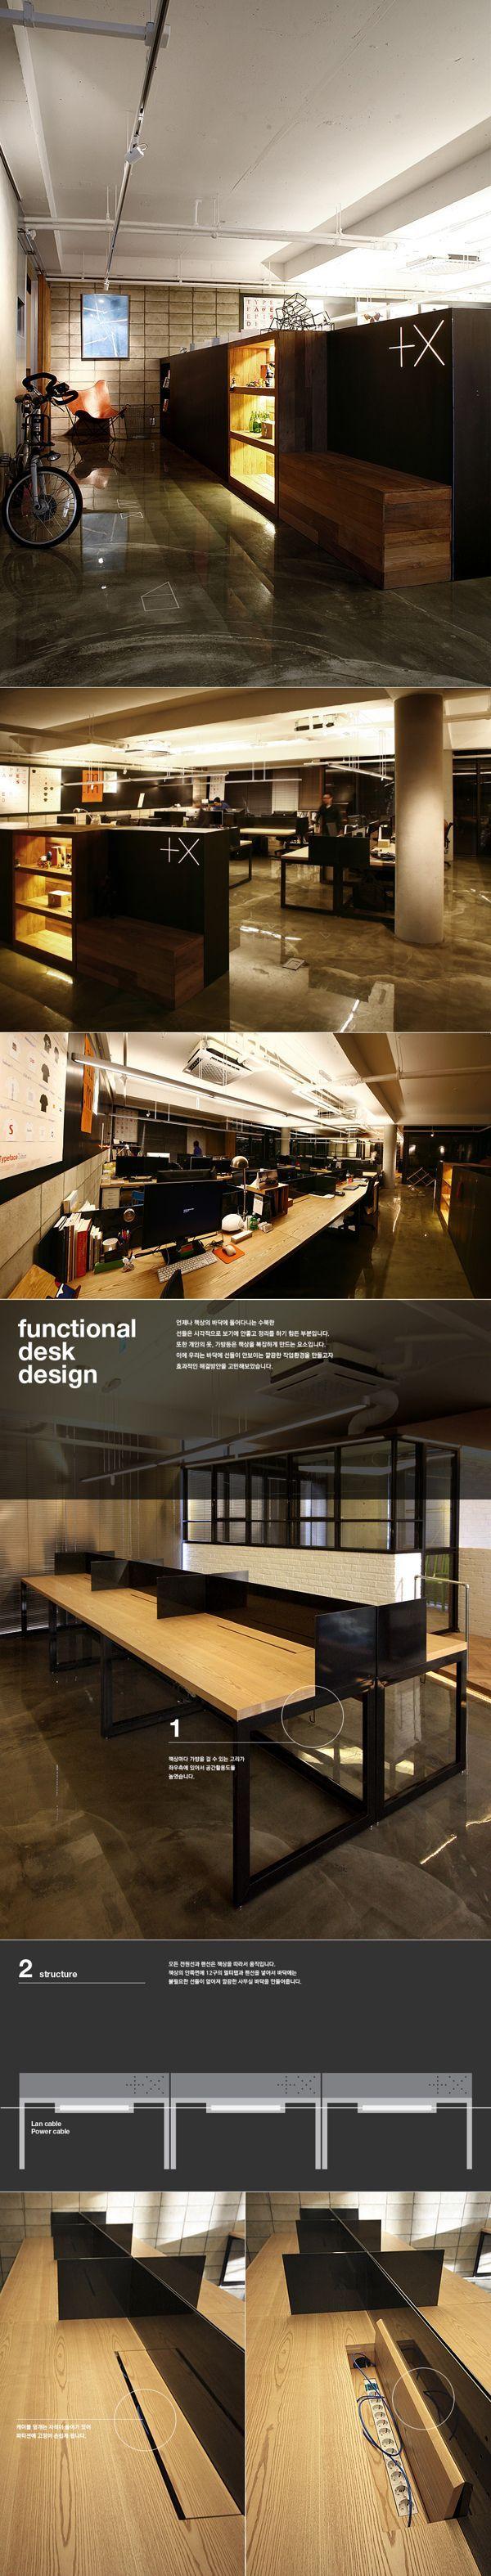 Plus X New Office Space Design by Plus X , via Behance: